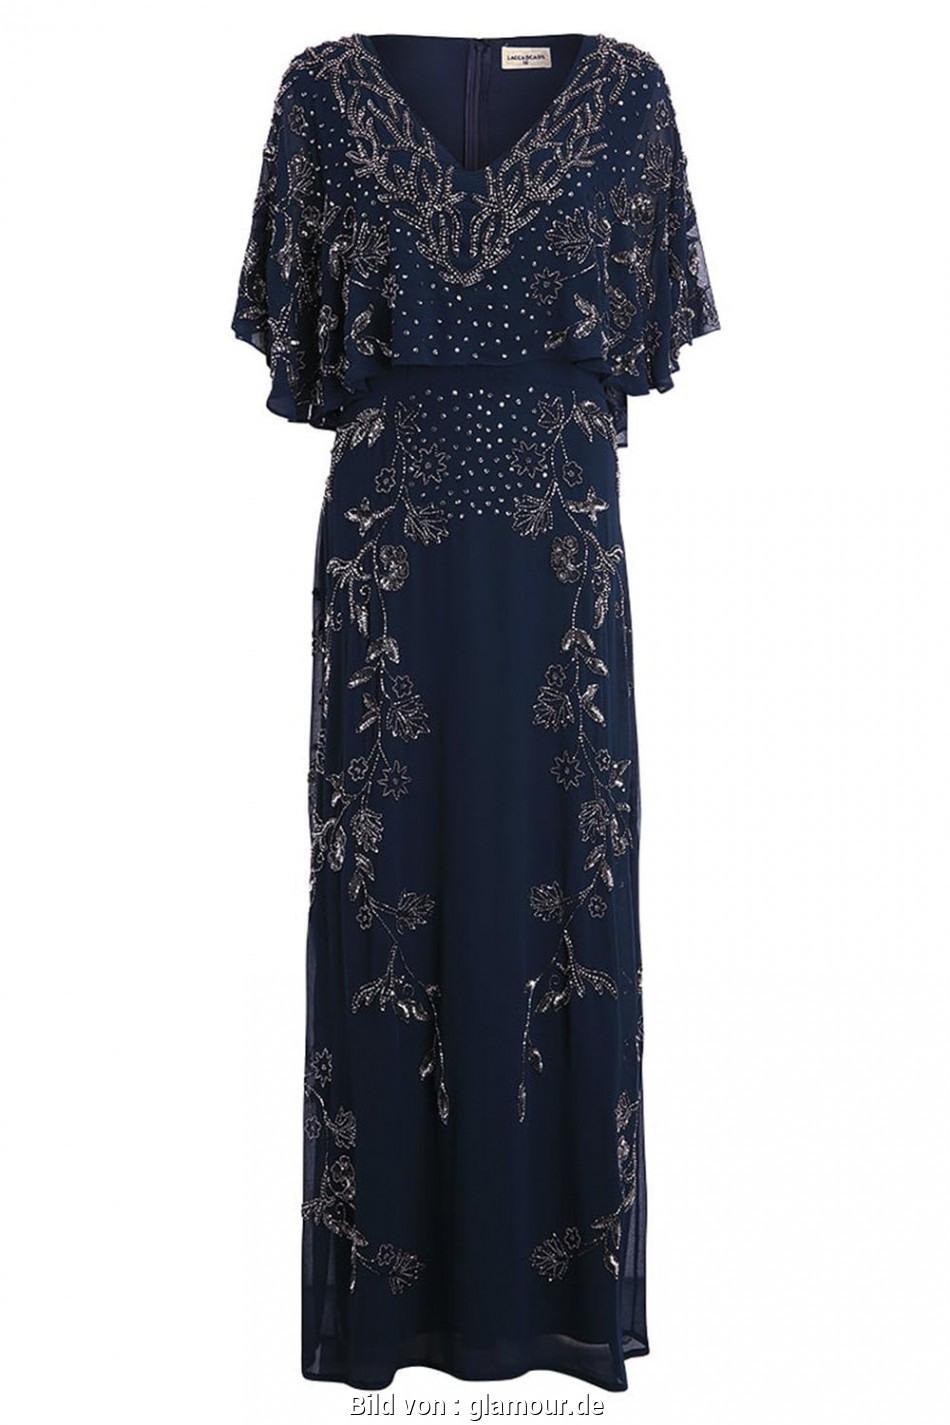 Abend Coolste Zalando Abendkleid Lang StylishAbend Genial Zalando Abendkleid Lang Vertrieb